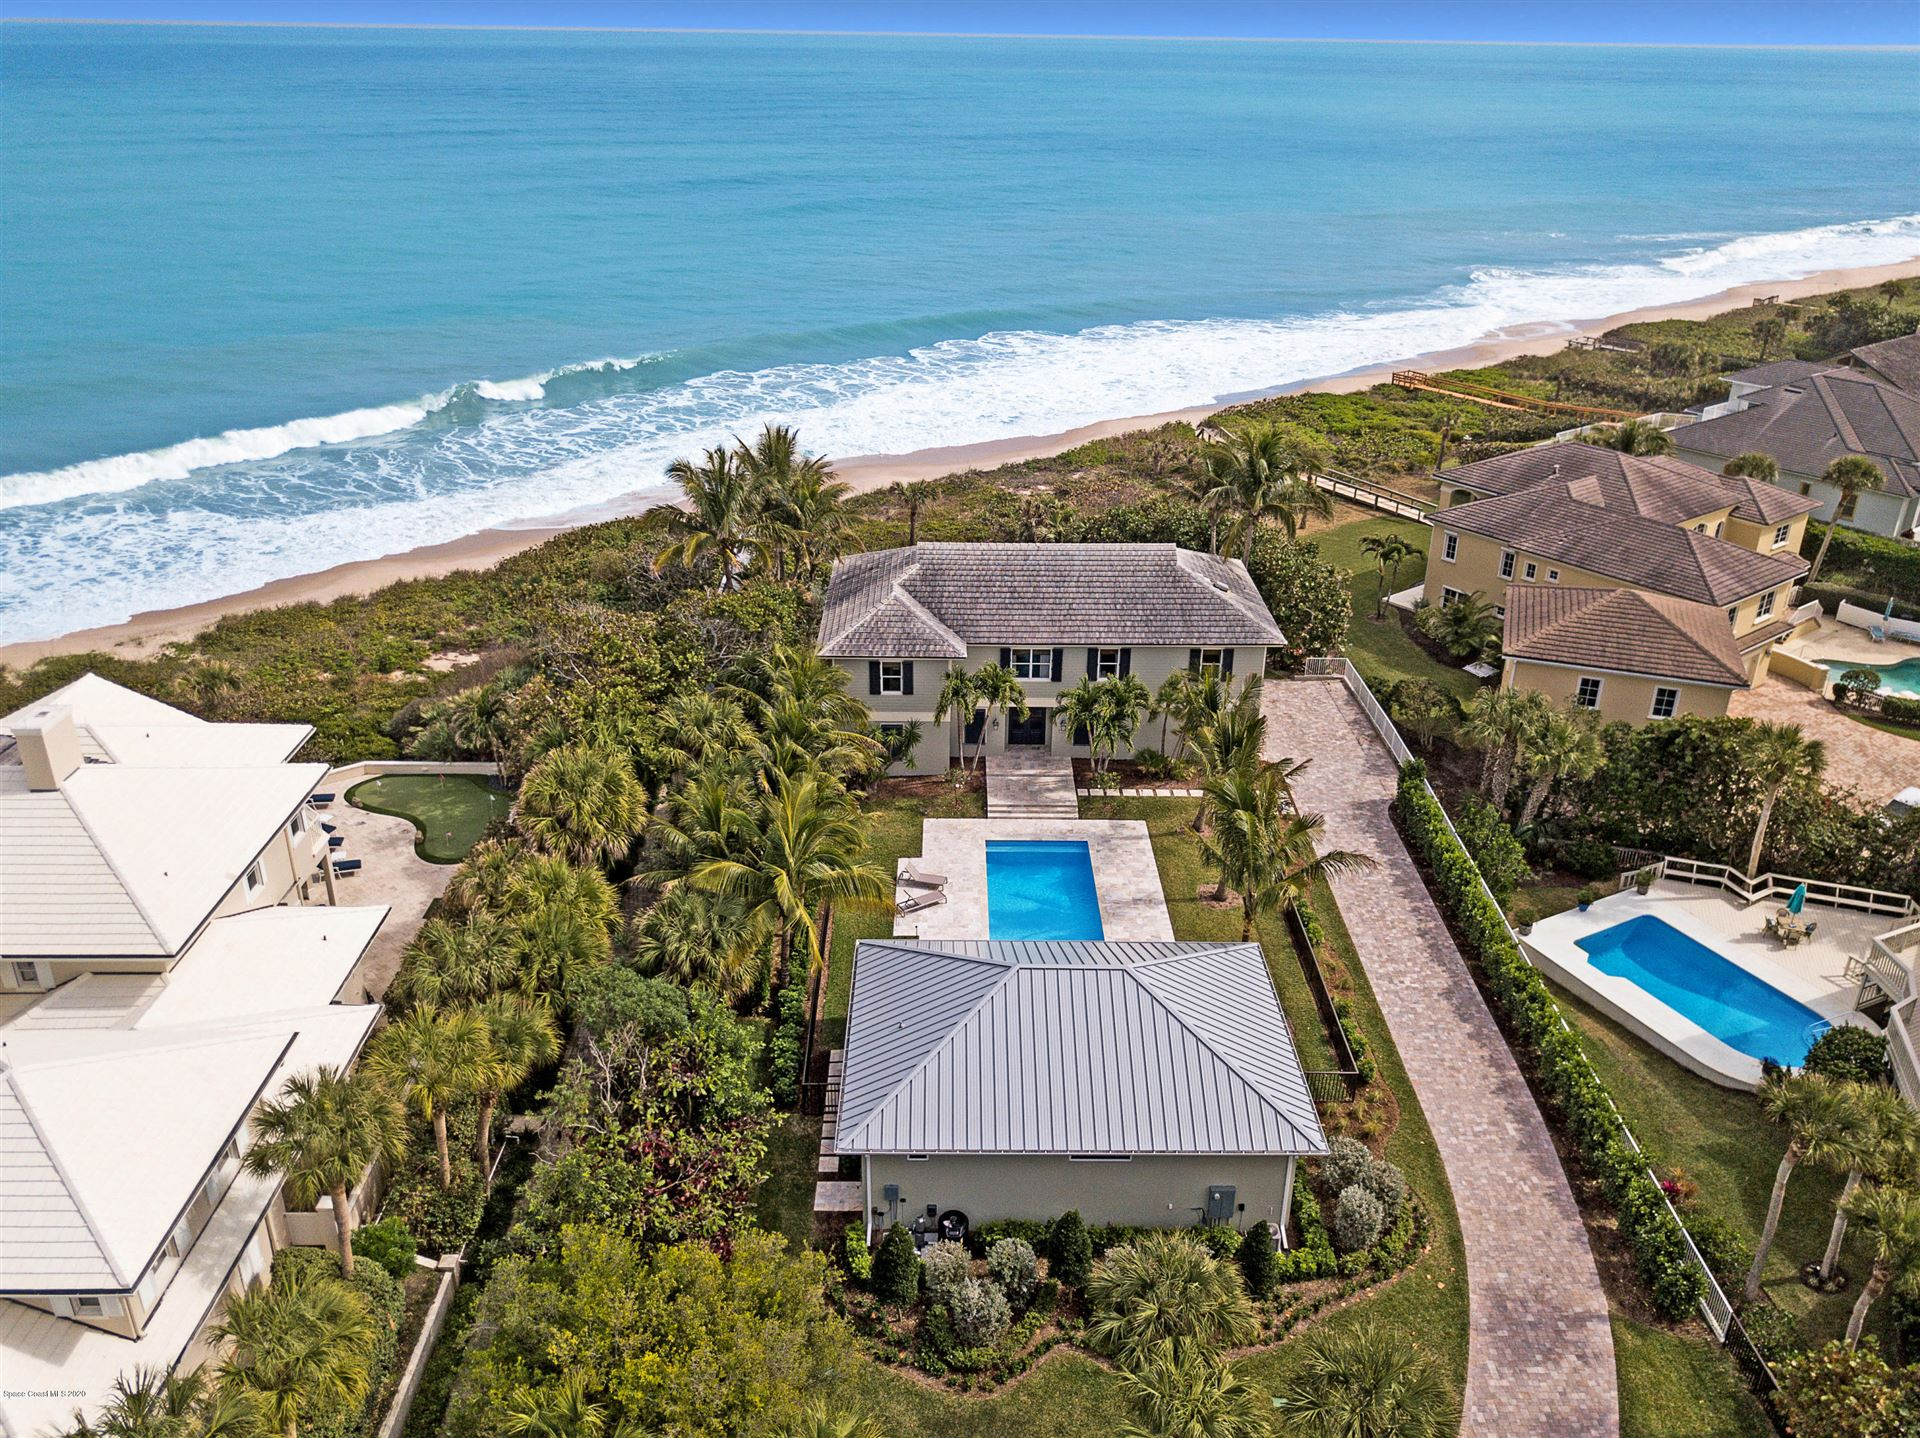 1580 Shorelands Drive, Vero Beach, FL 32963 - #: 869764